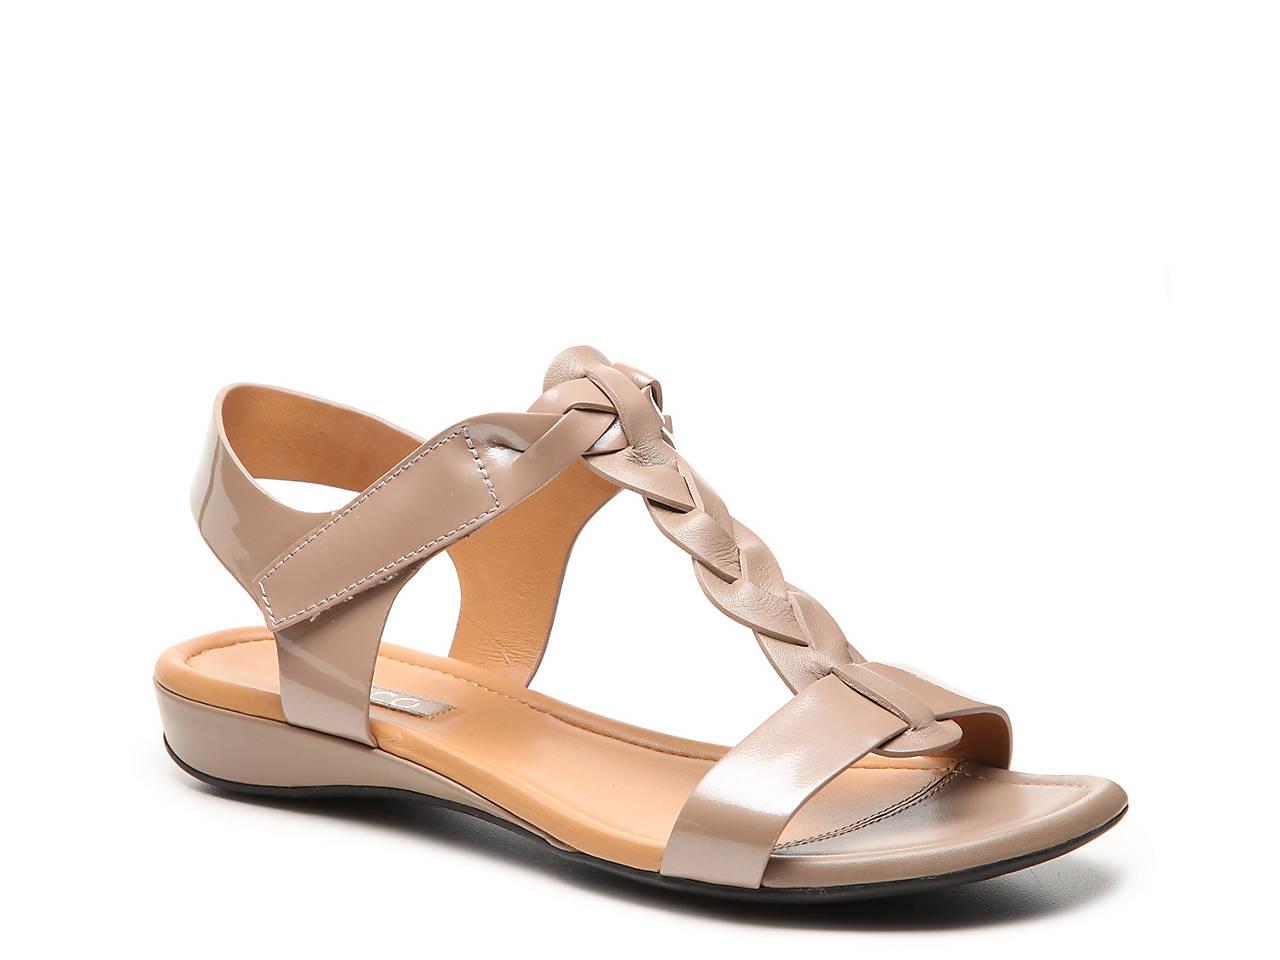 ecco shoes cheap sale, ECCO Casual Bouillon Sandal,ecco